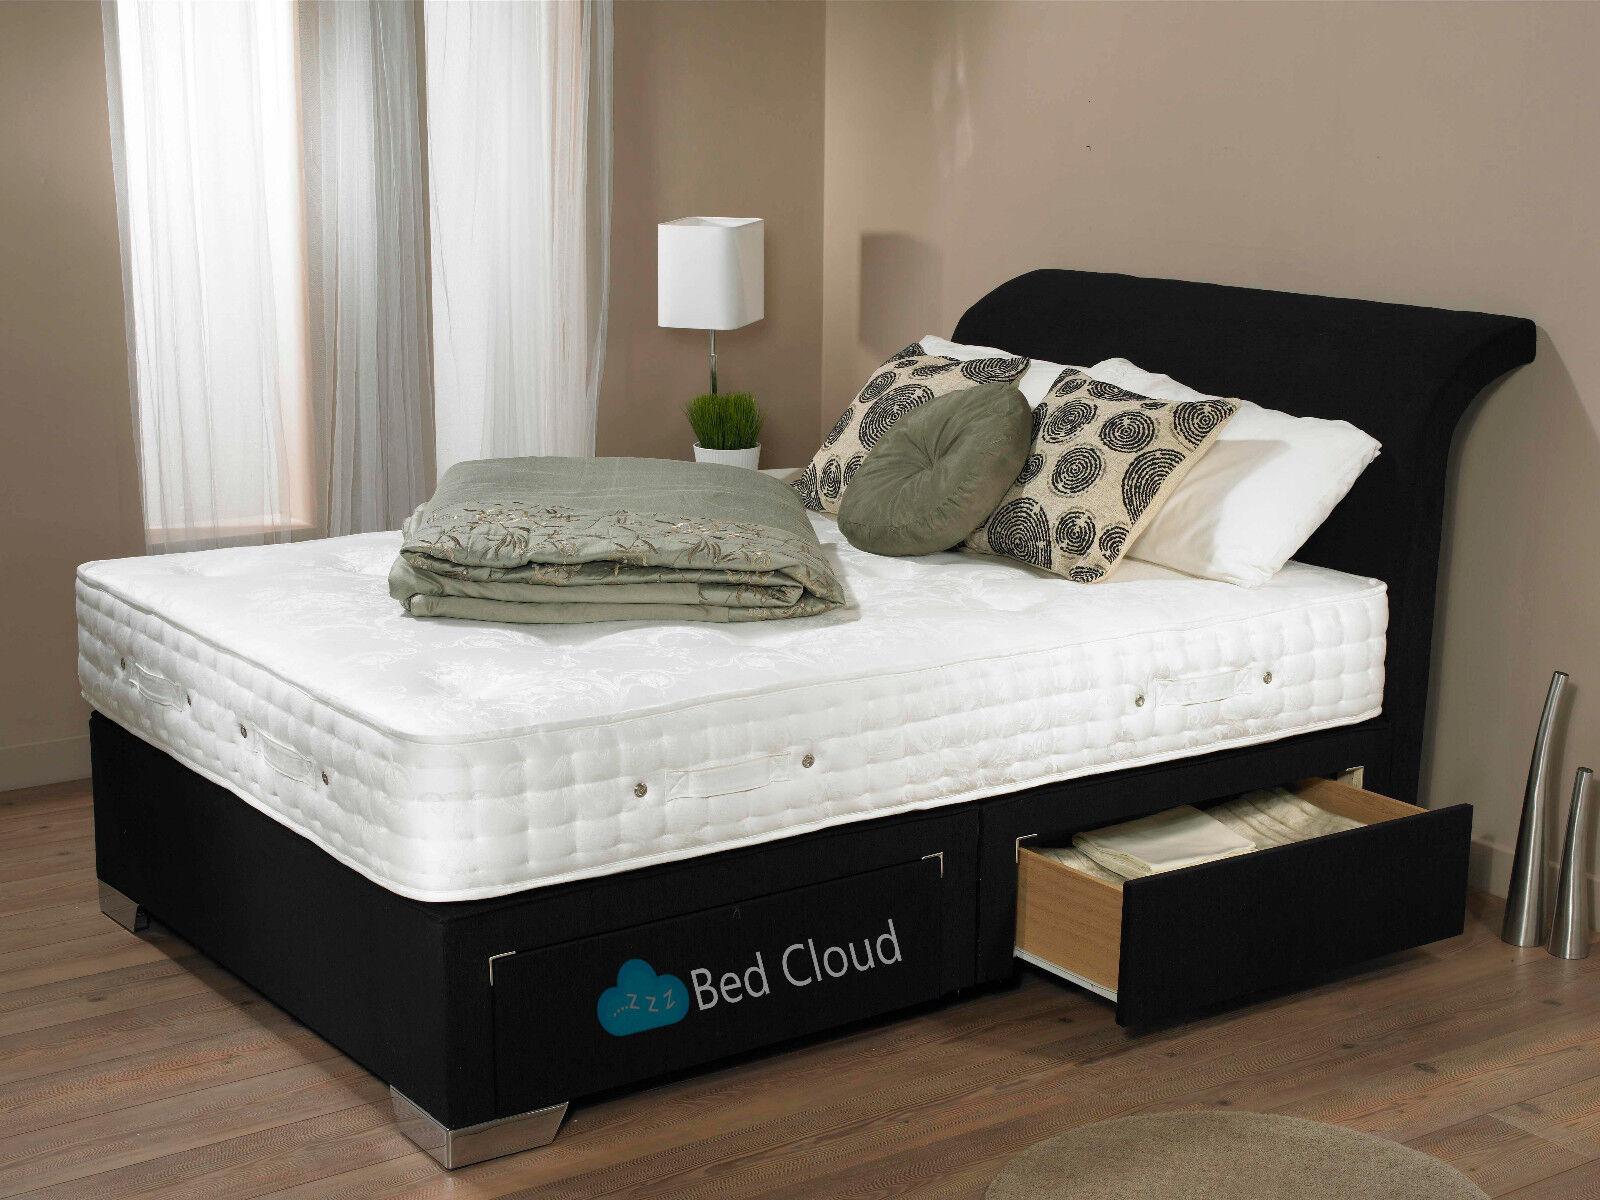 Utopia 3ft Single Divan Bed With Free Memory Foam Mattress And Curve Headboard Ebay